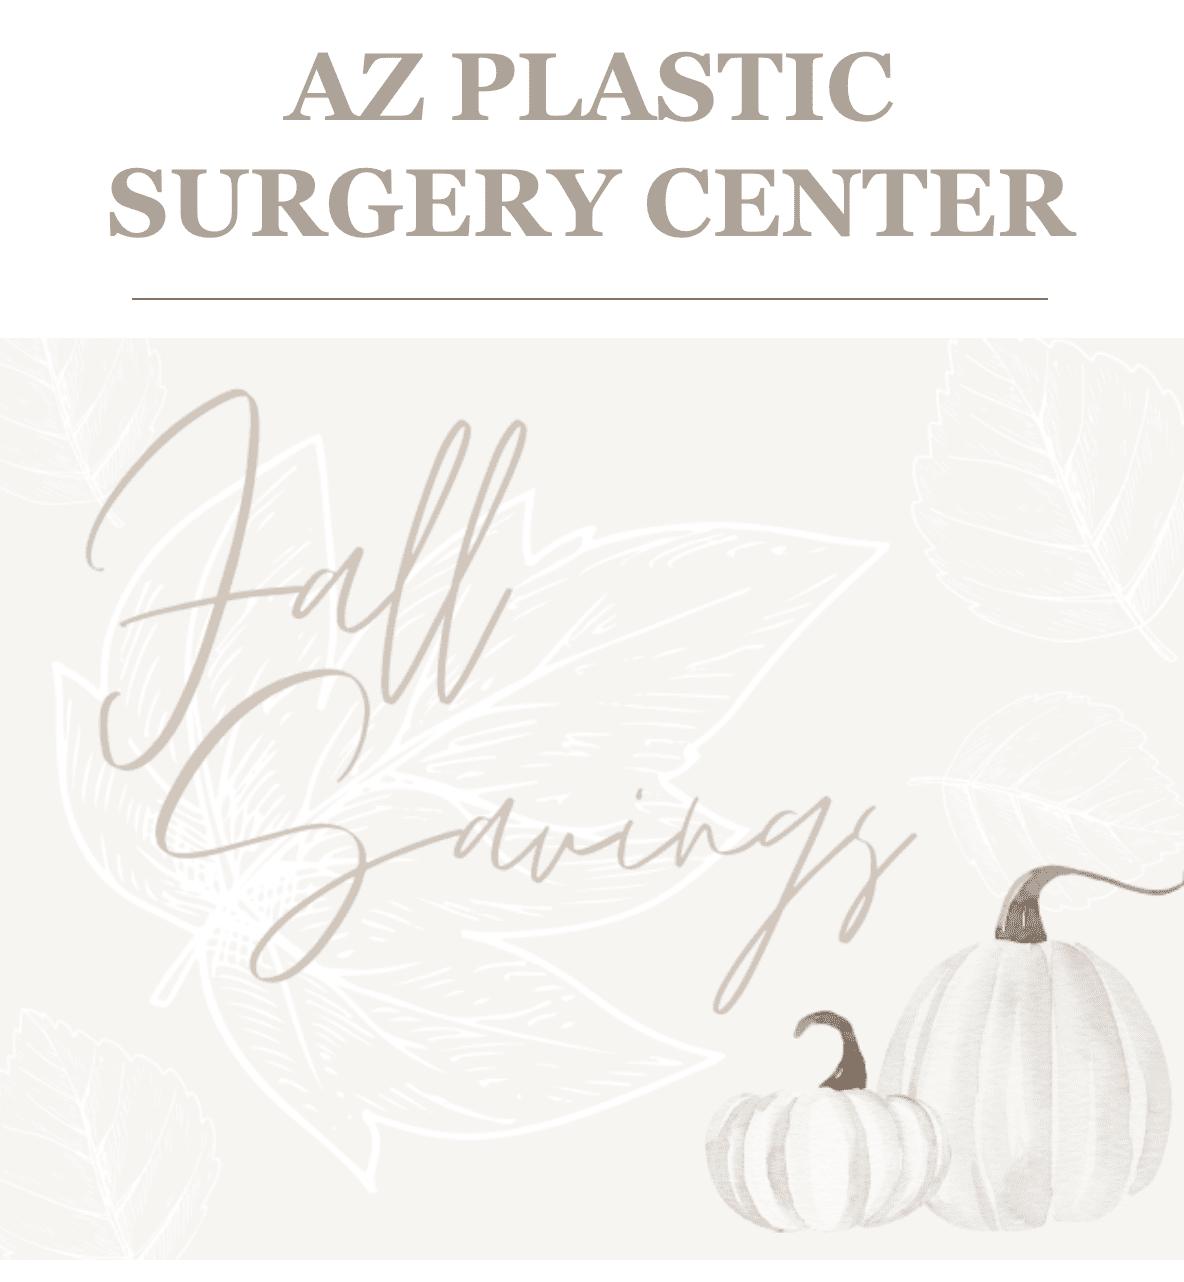 AZ Plastic Surgery Center. Fall Savings